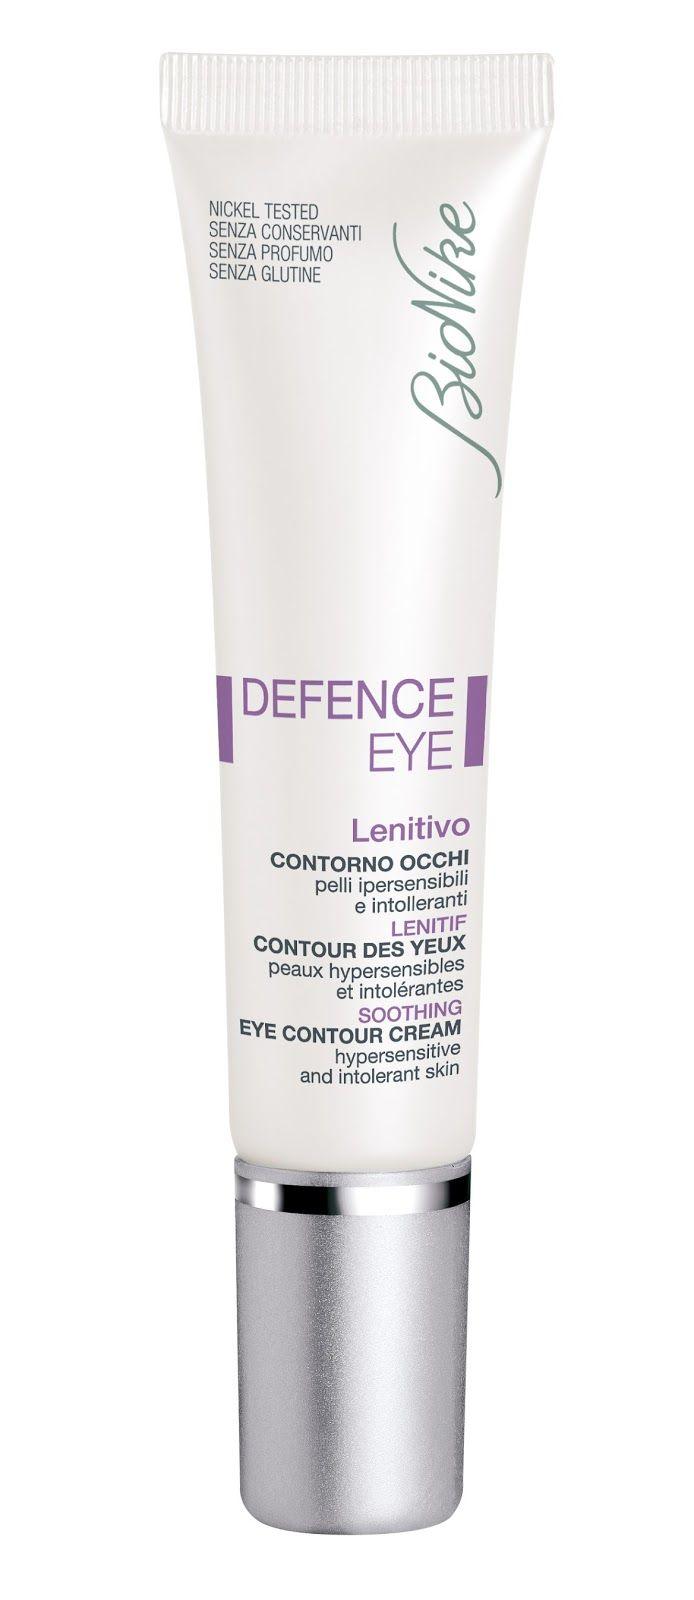 Consigli di Makeup: Preview: Defence Eye - Bionike ...